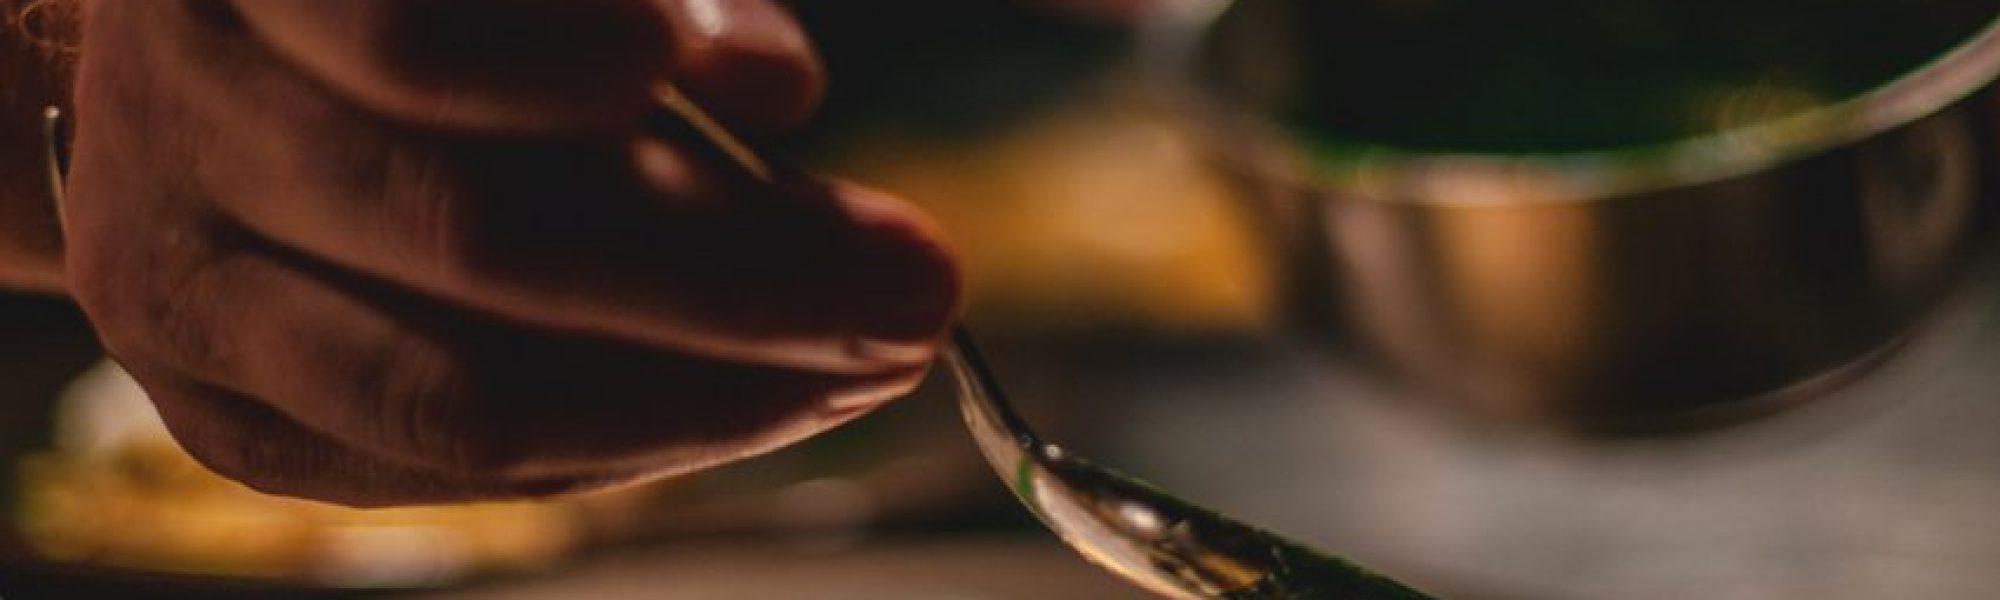 blur-chef-close-up-2403391